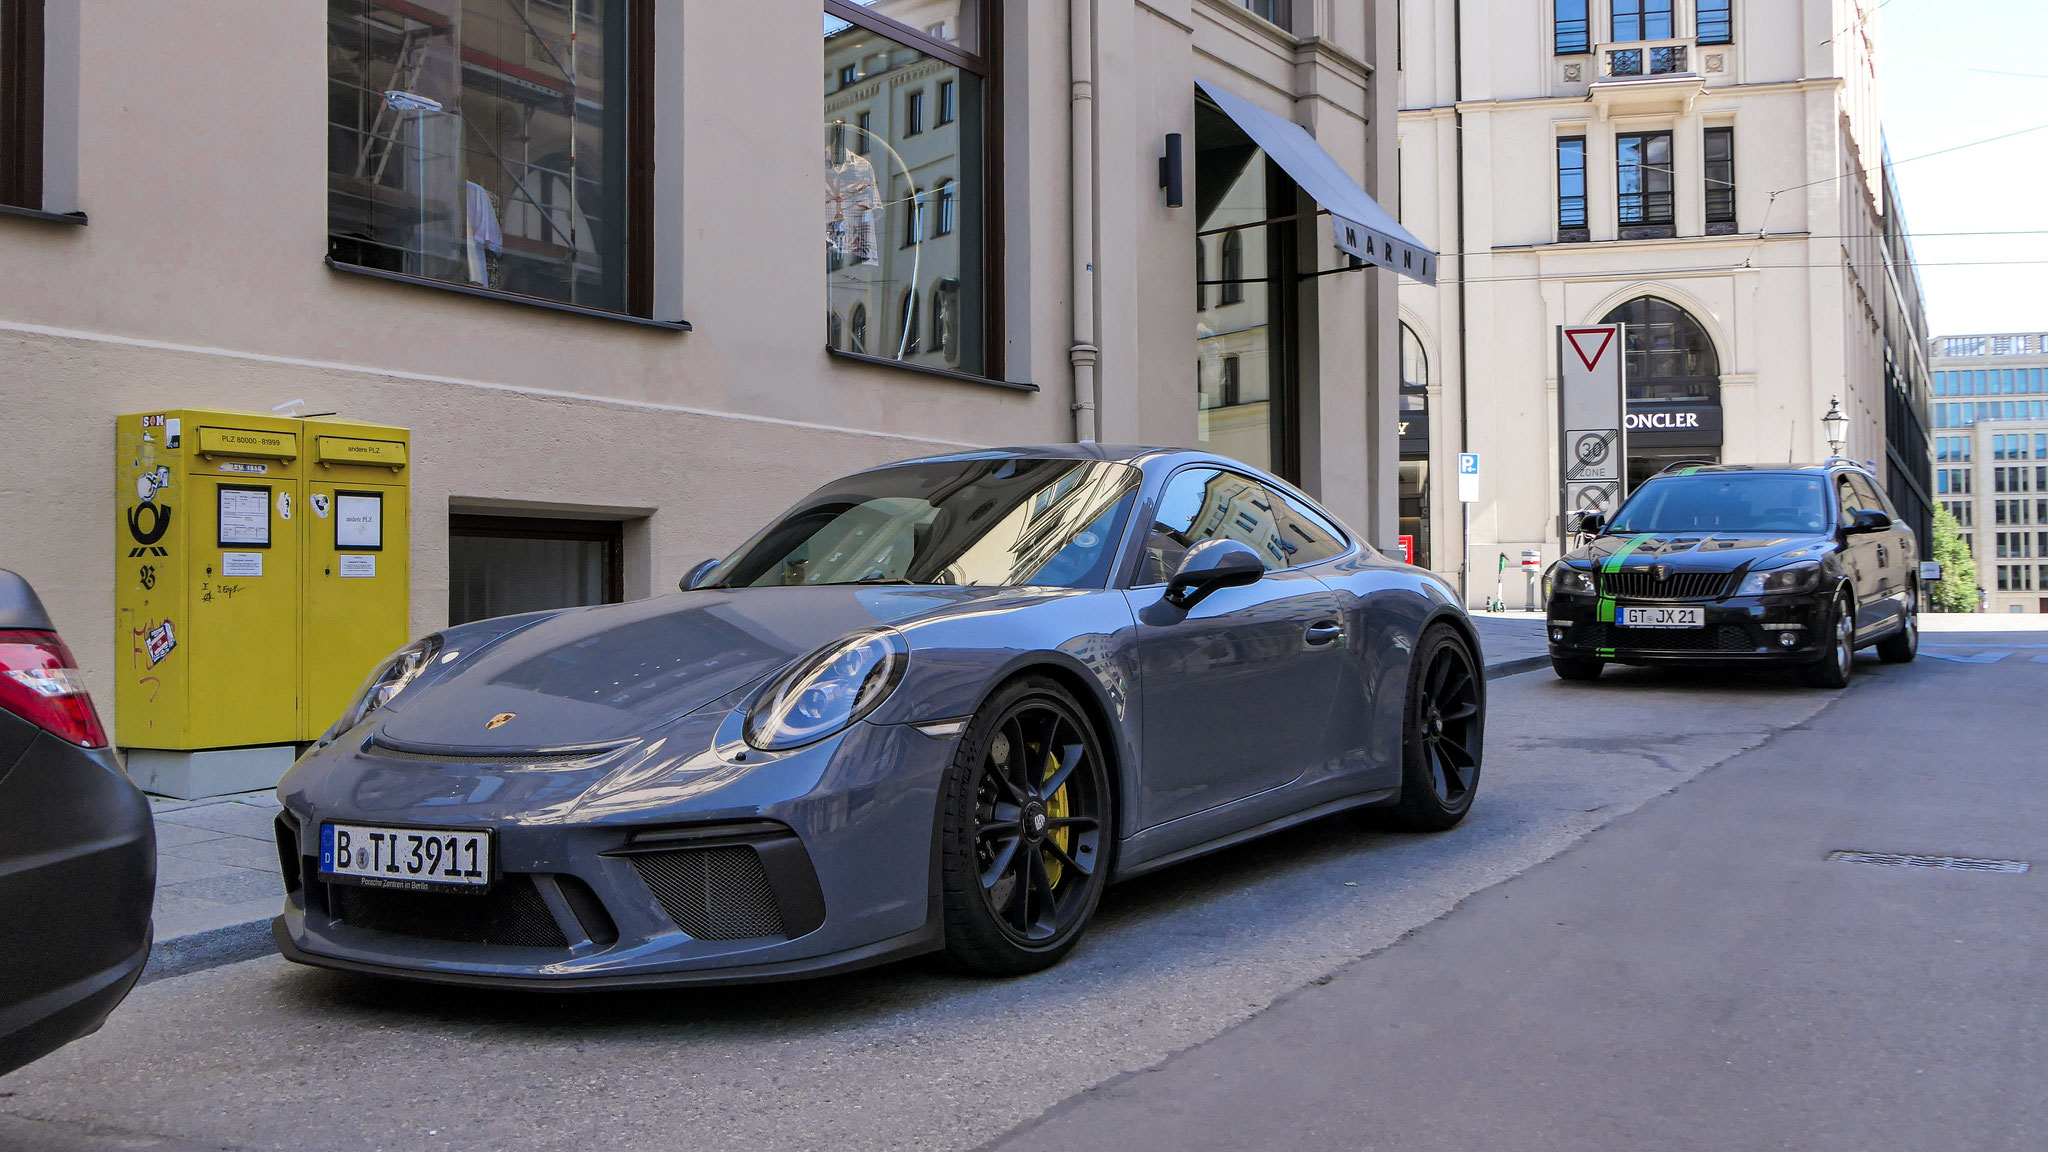 Porsche 991 GT3 Touring Package - B-TI-3911